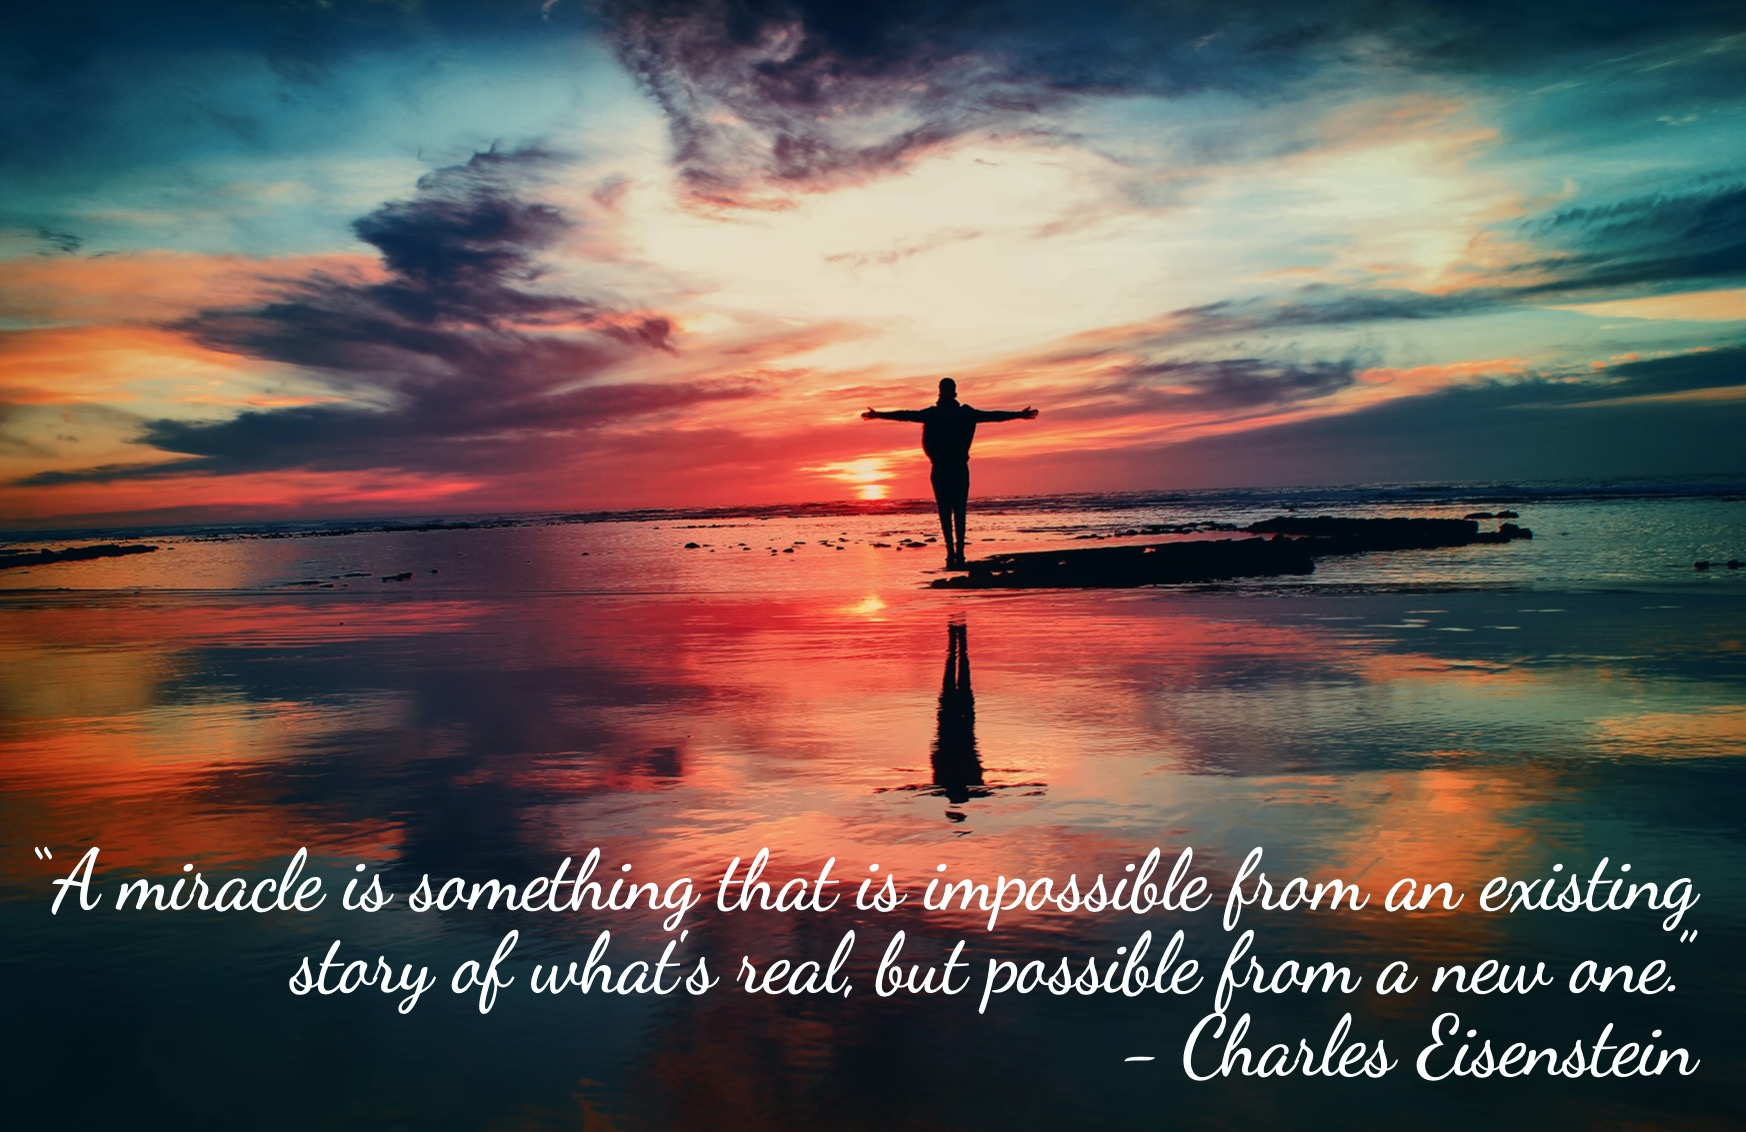 Charles Eisenstein: From Separation to Interbeing